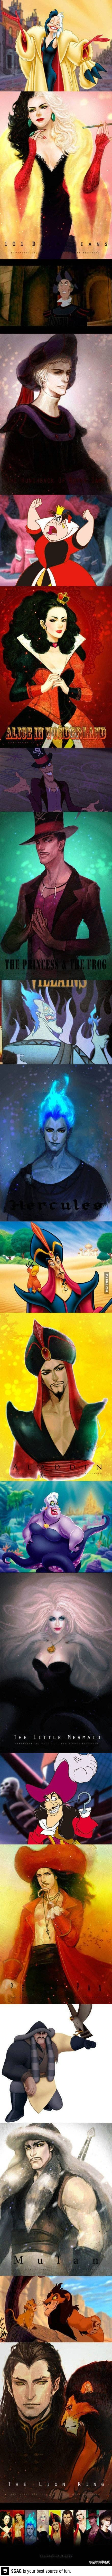 Disney Antagonists!